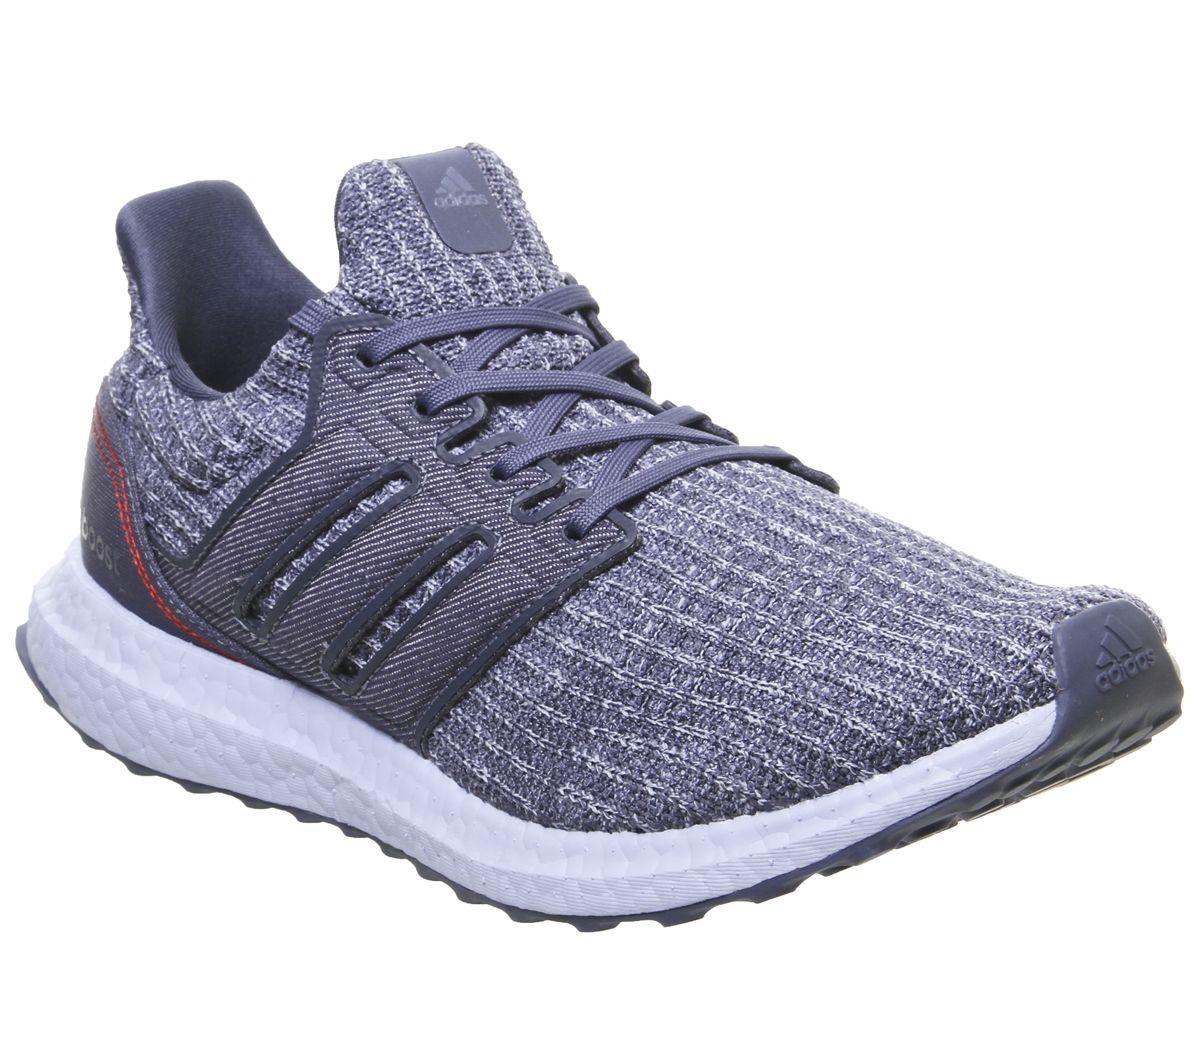 Detalles de Adidas Ultraboost Ultra Boost Zapatillas Tech Tinta M Zapatillas Deportivas